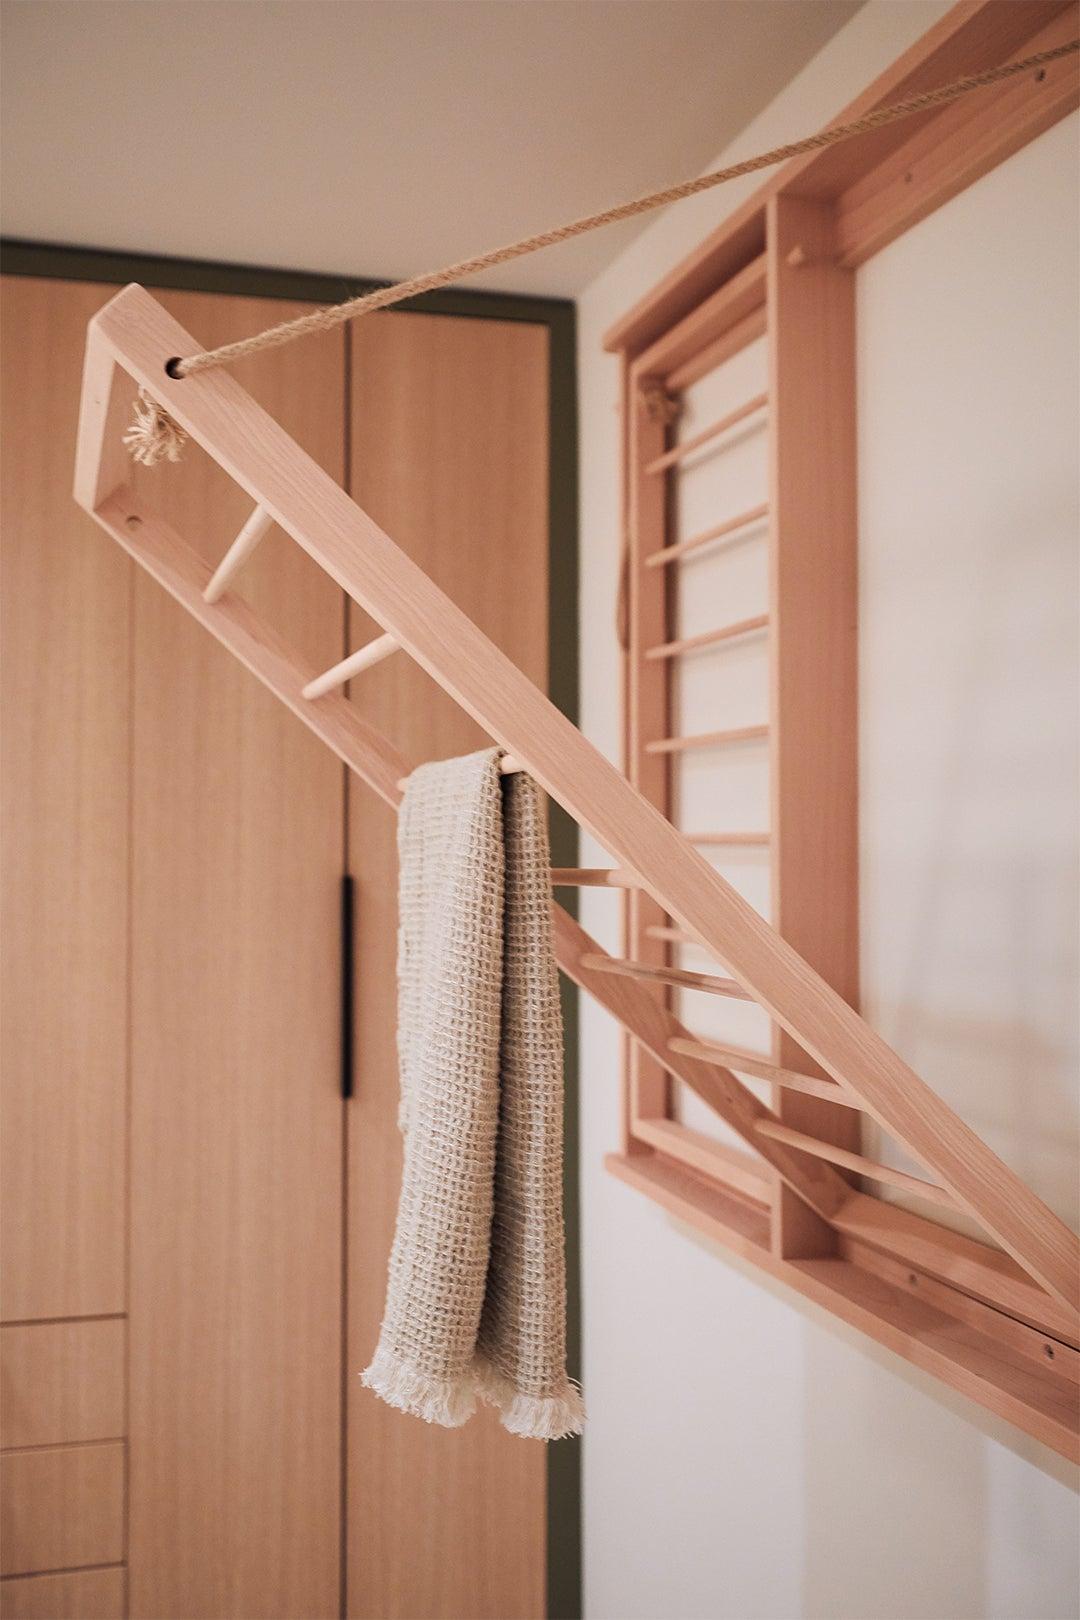 Built-in drying rack